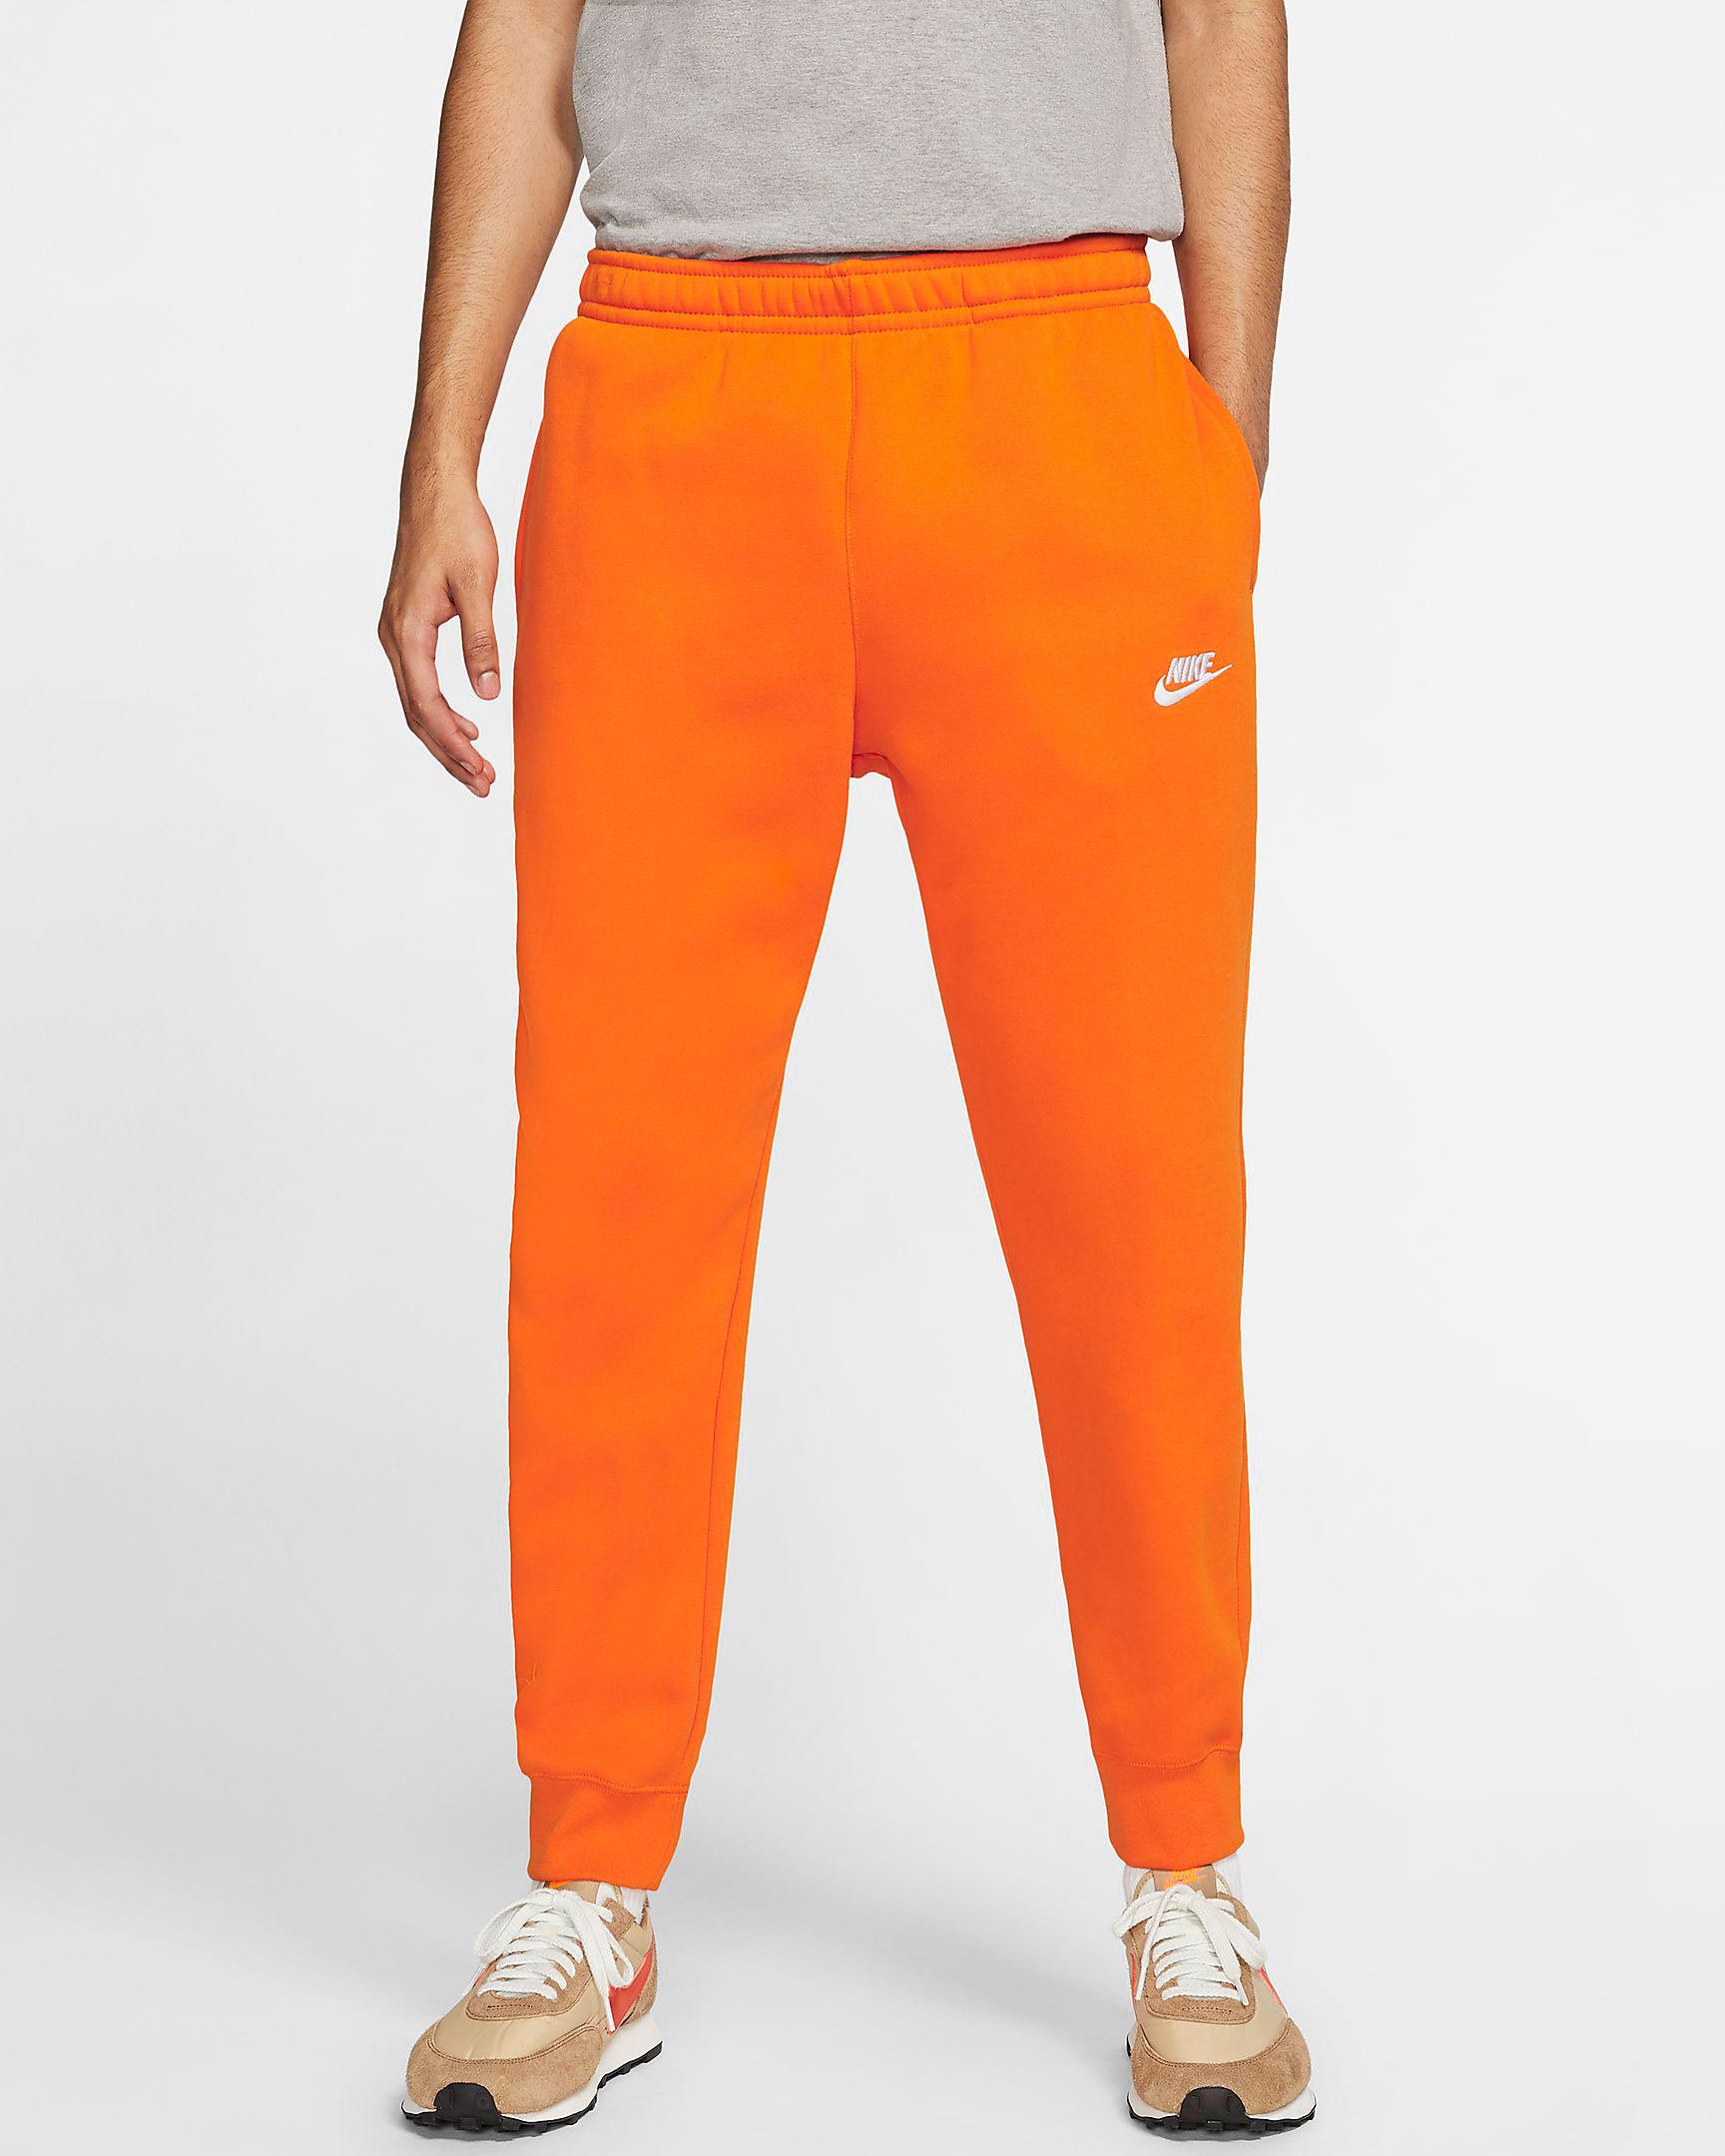 nike-sportswear-orange-jogger-pants